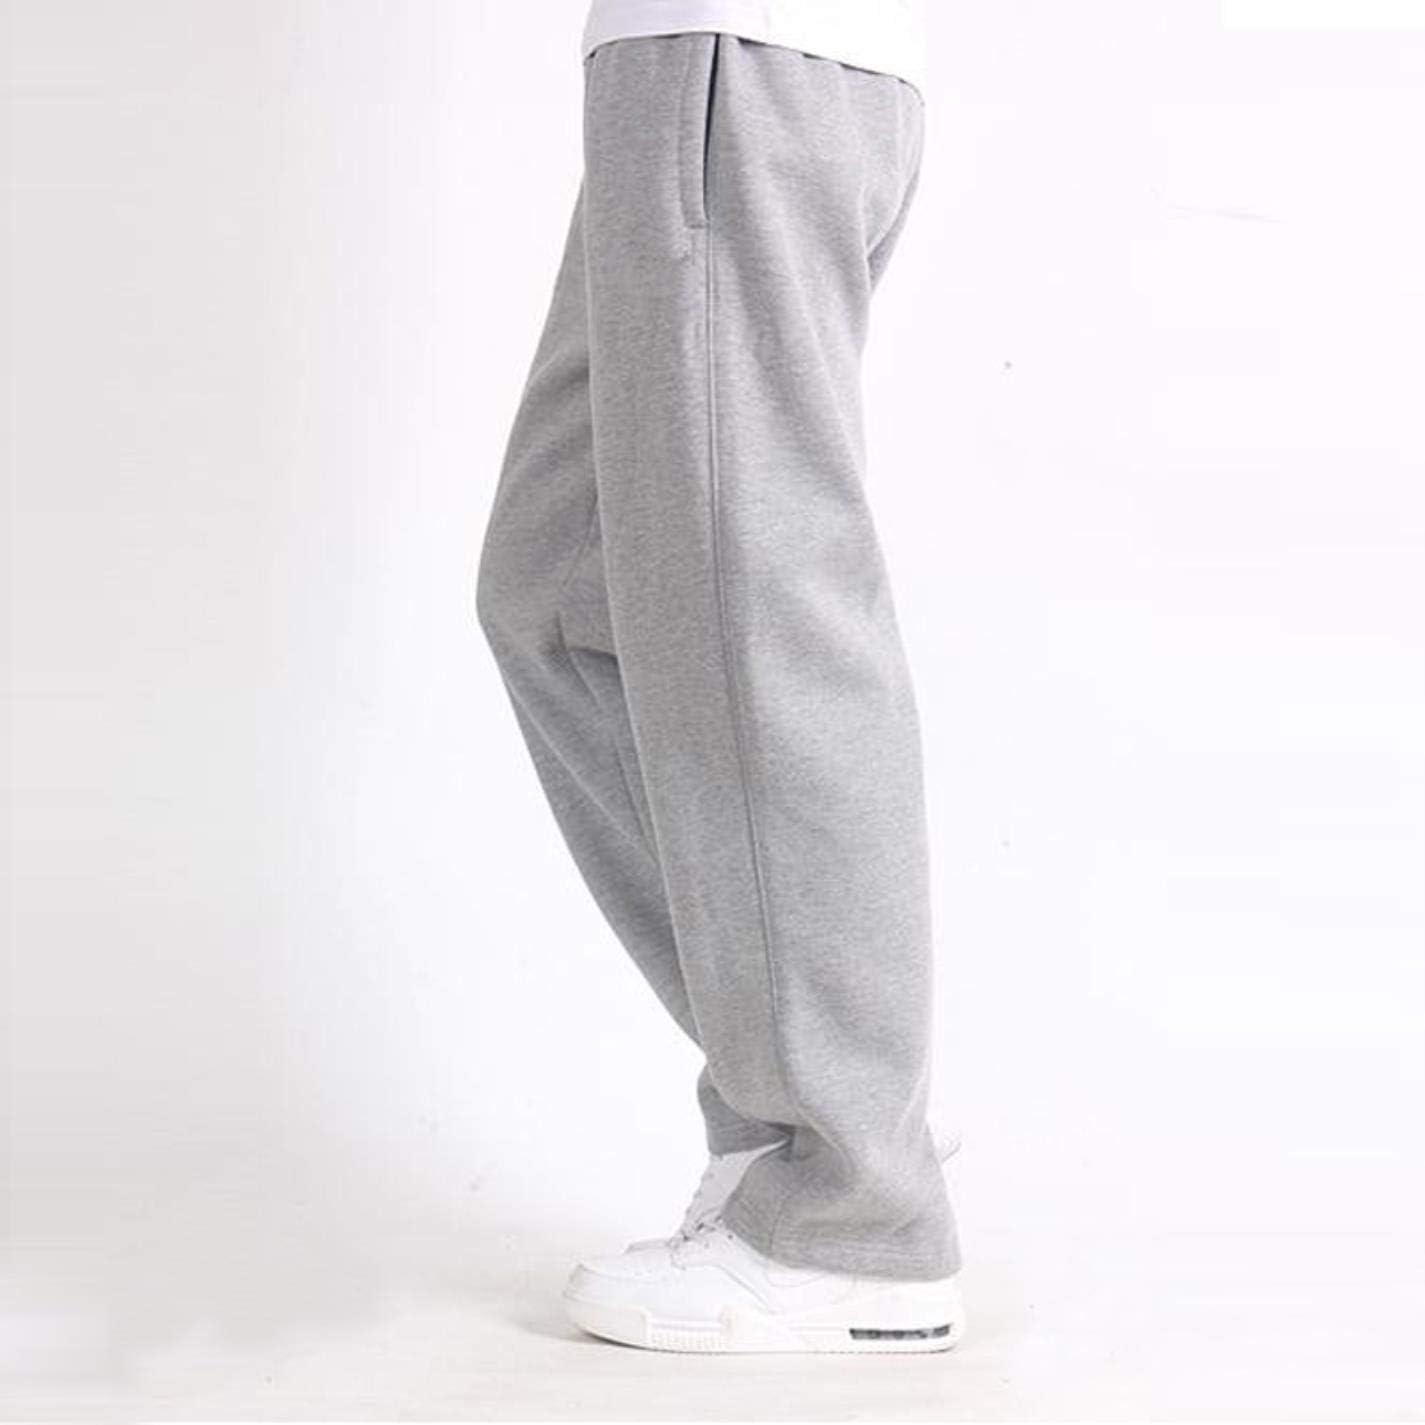 UiVily Mens Plus Size 6XL Solid Baggy Loose Elastic Cotton Sweat Pants